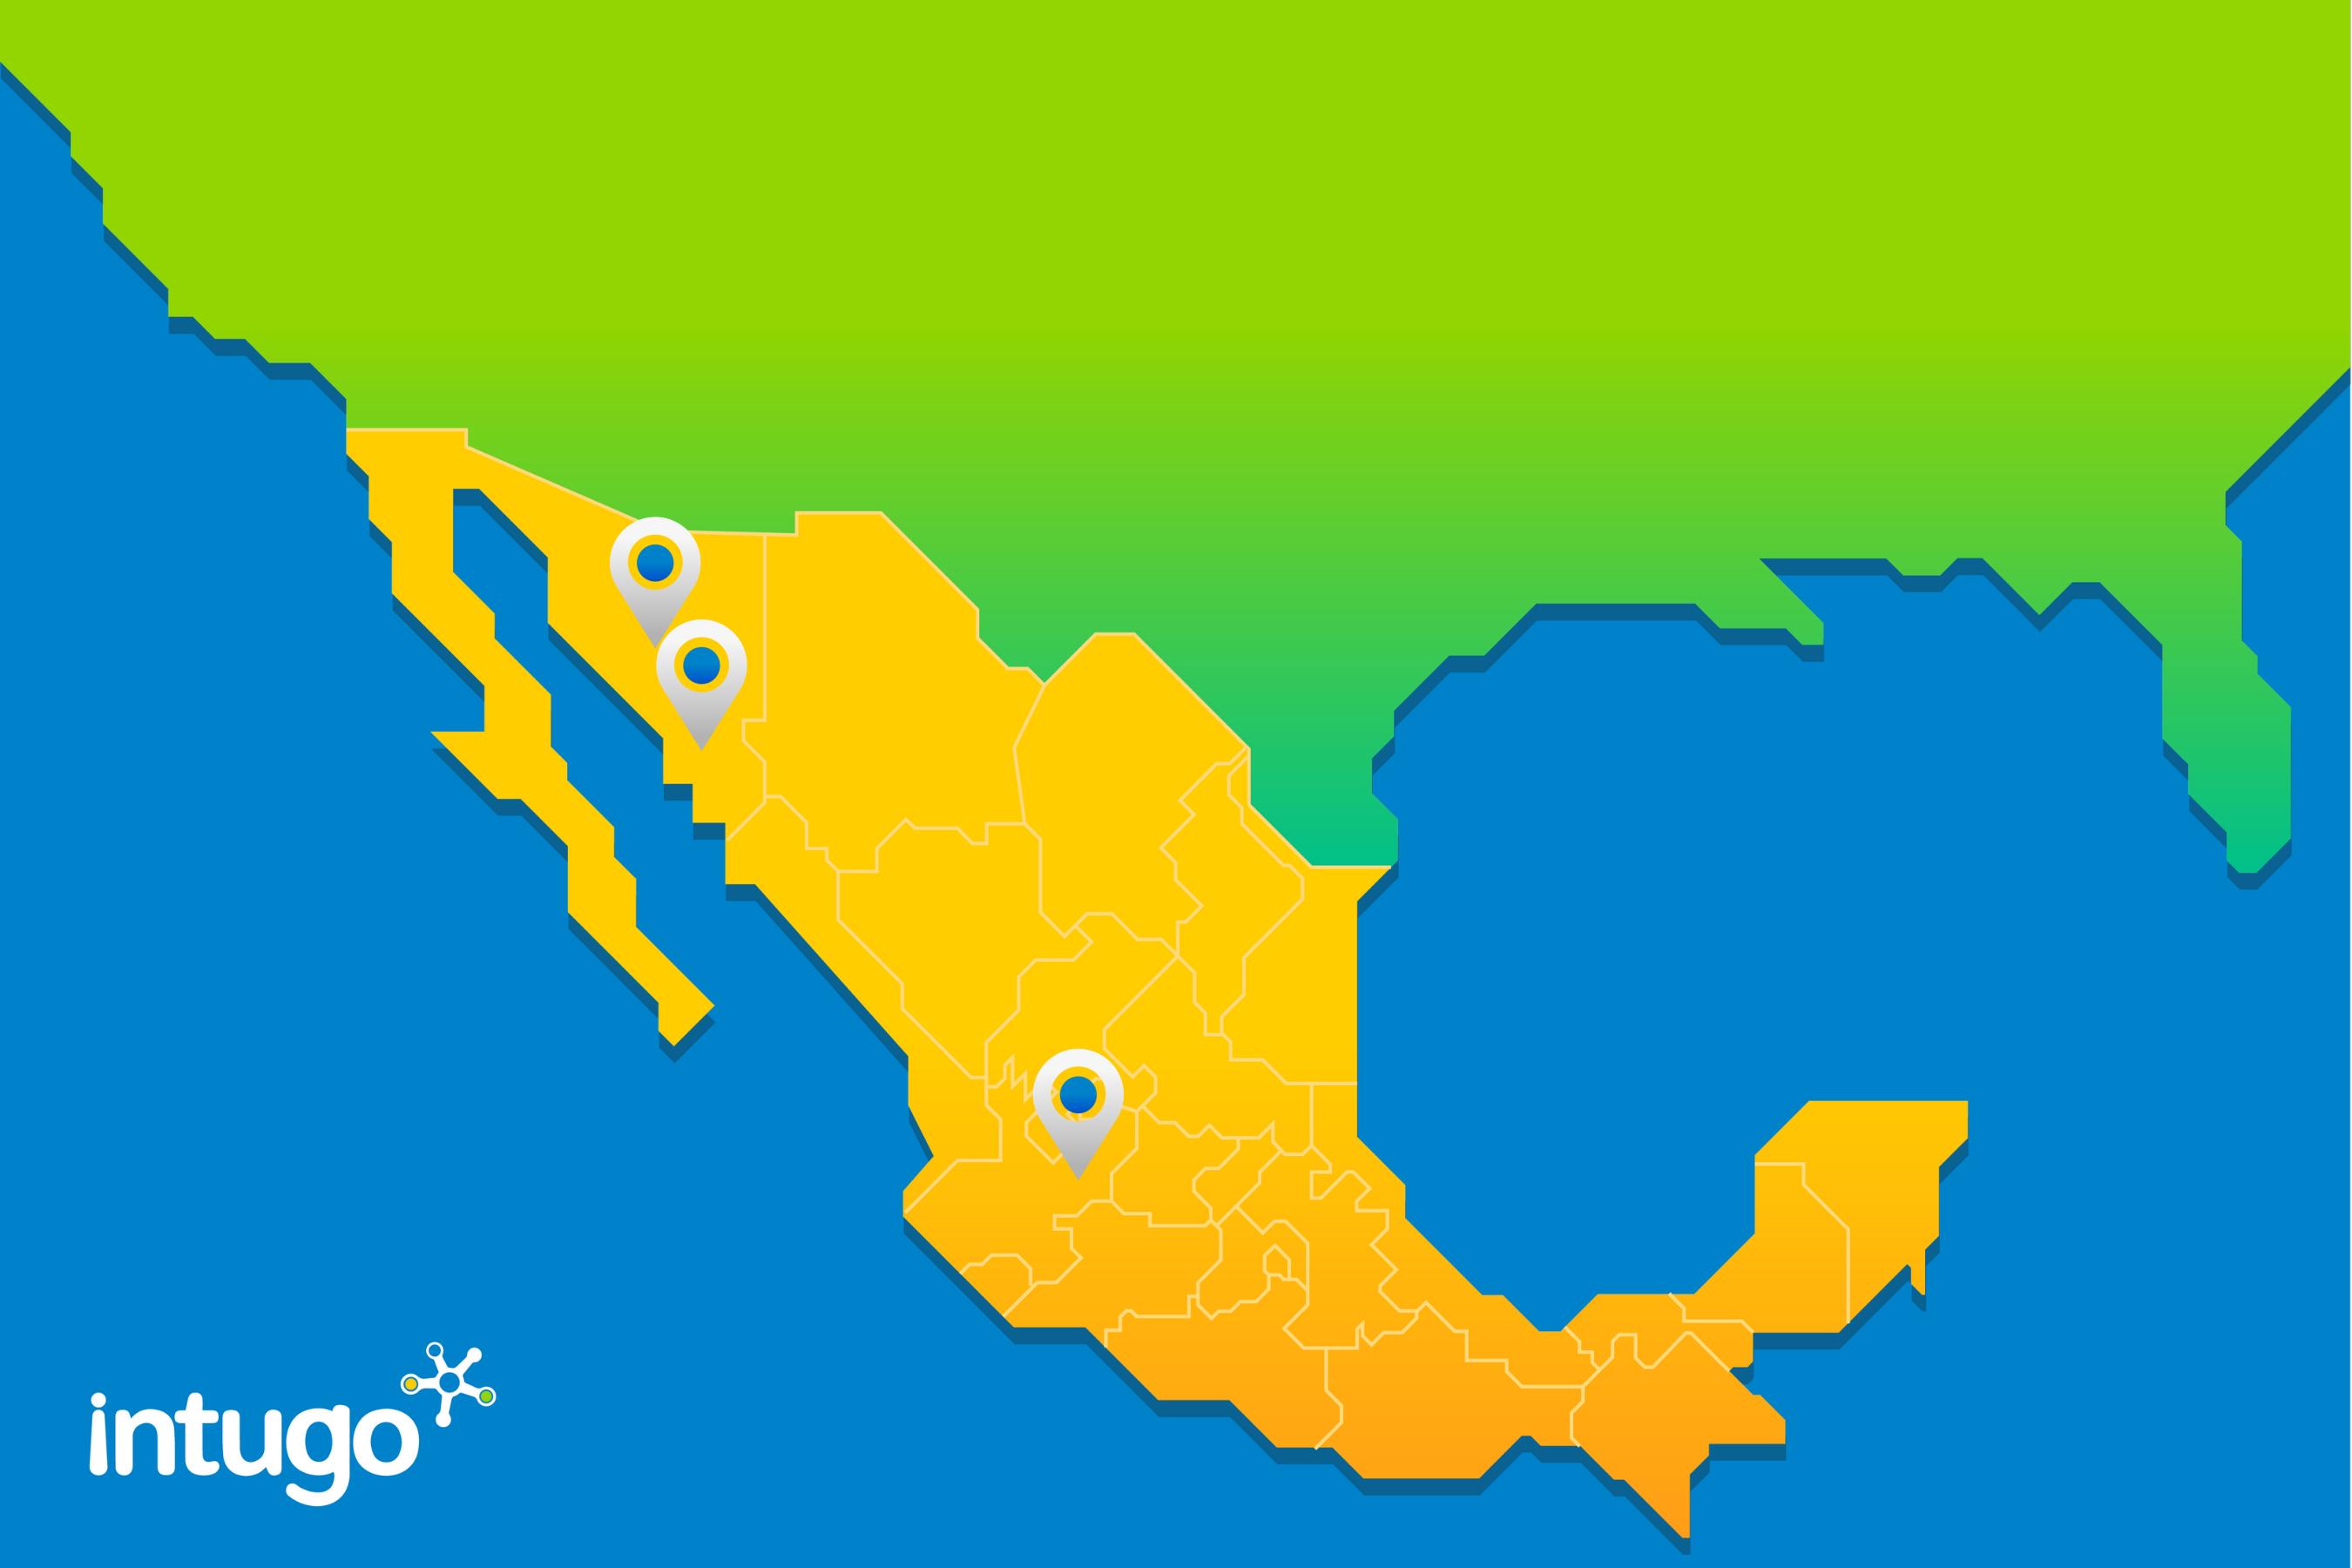 Intugo Map Locations